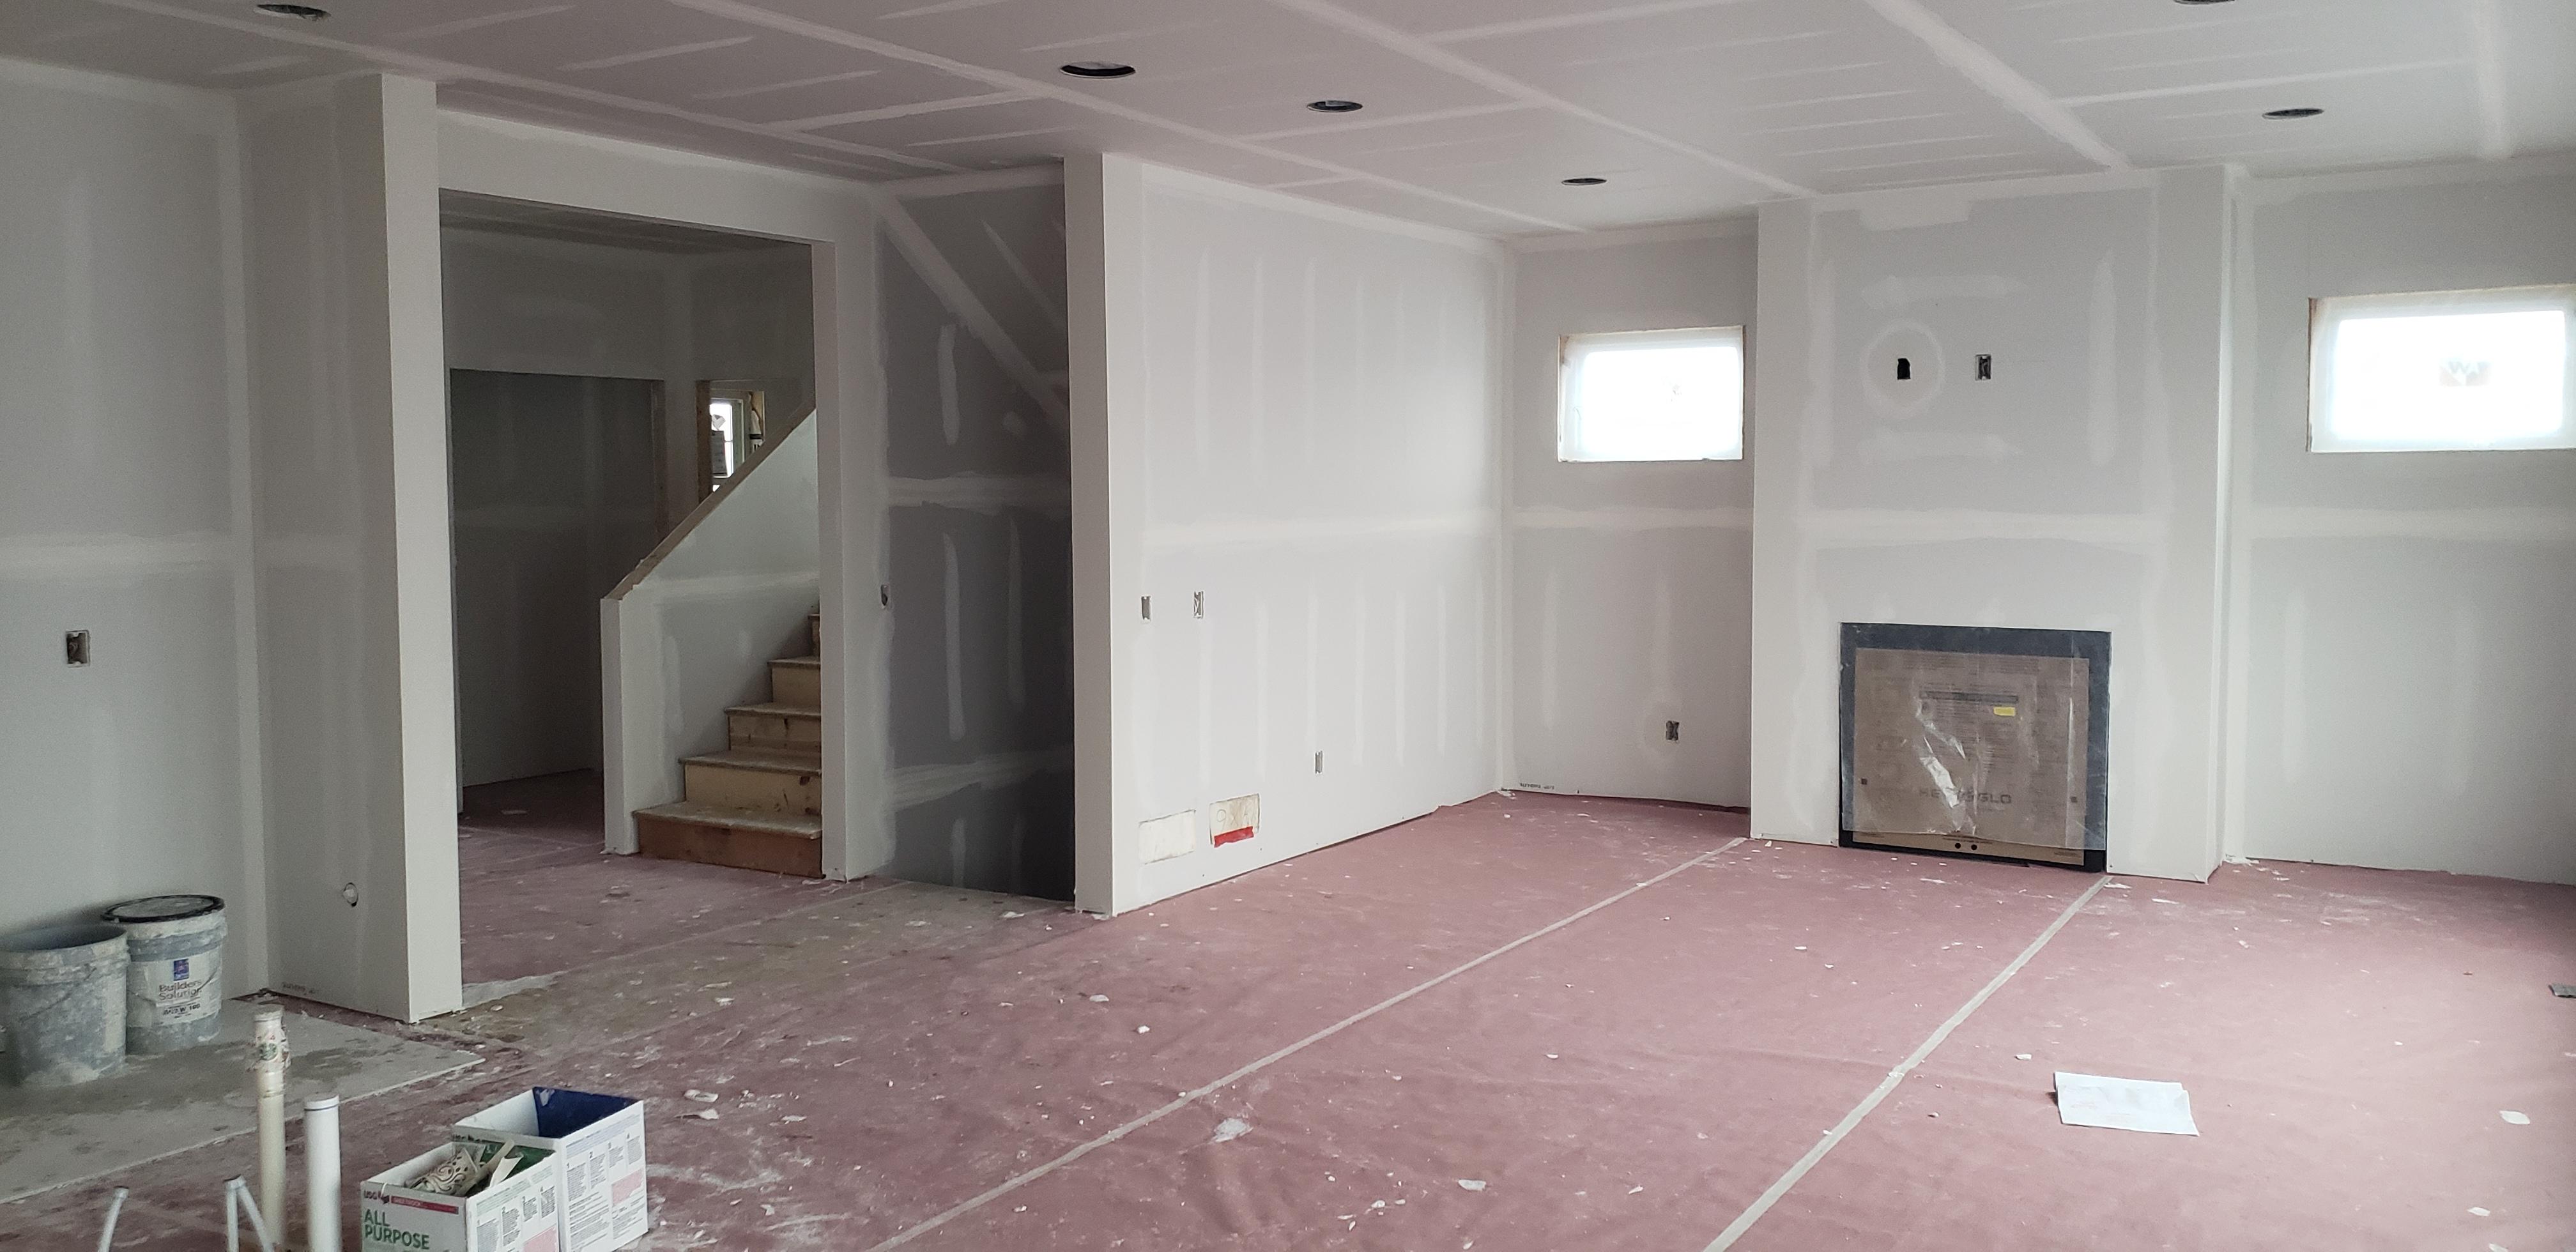 Community Cares MATTERhouse interior